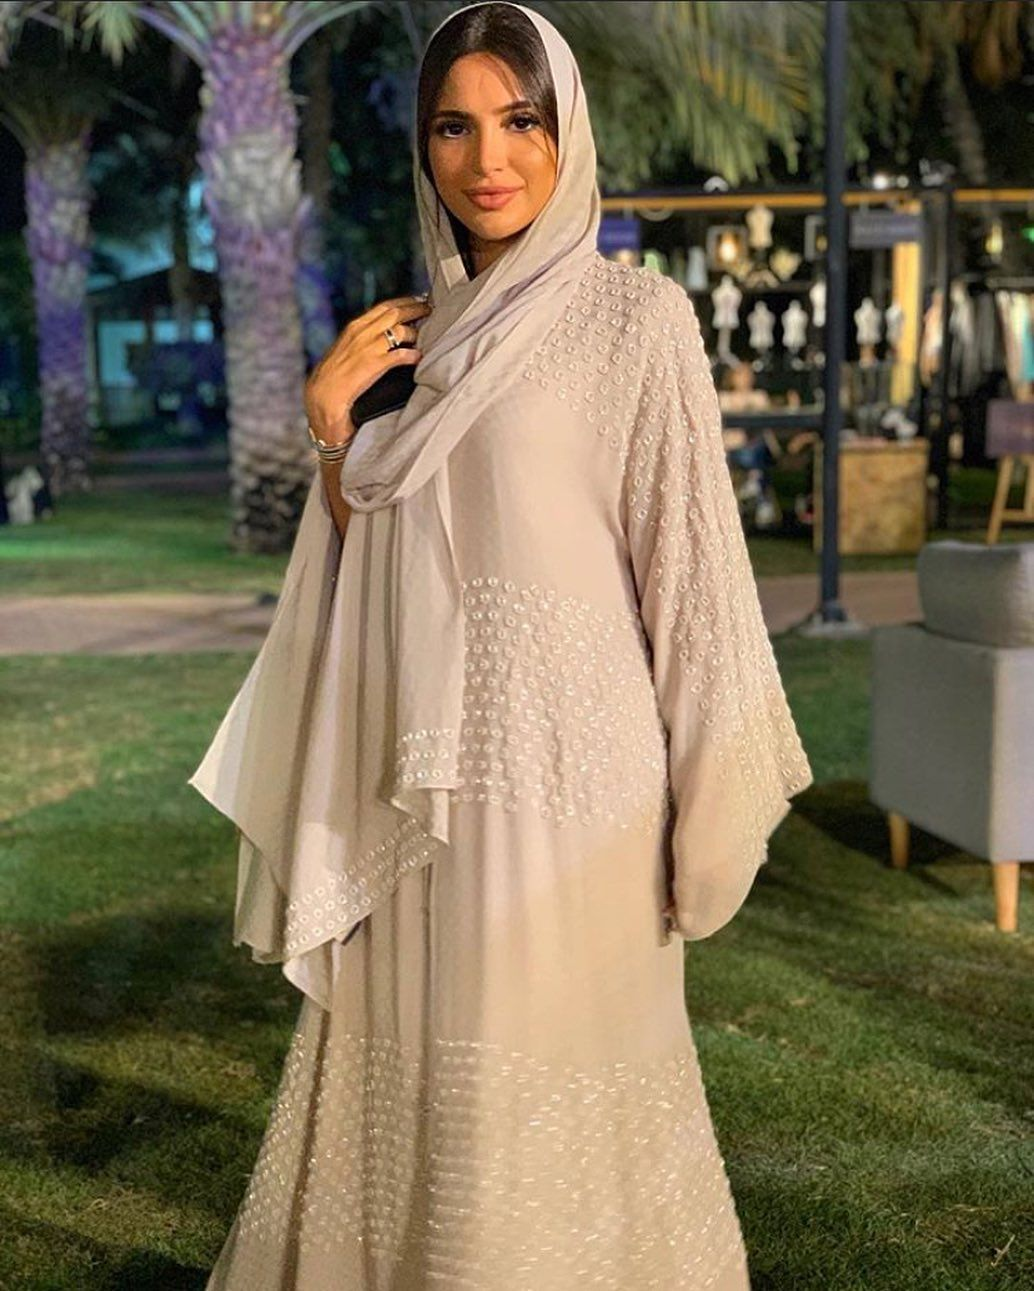 The Trends Ksa On Instagram مره بسيطة و تجنن Abayas Fashion Hijab Fashion Hijabi Outfits Casual